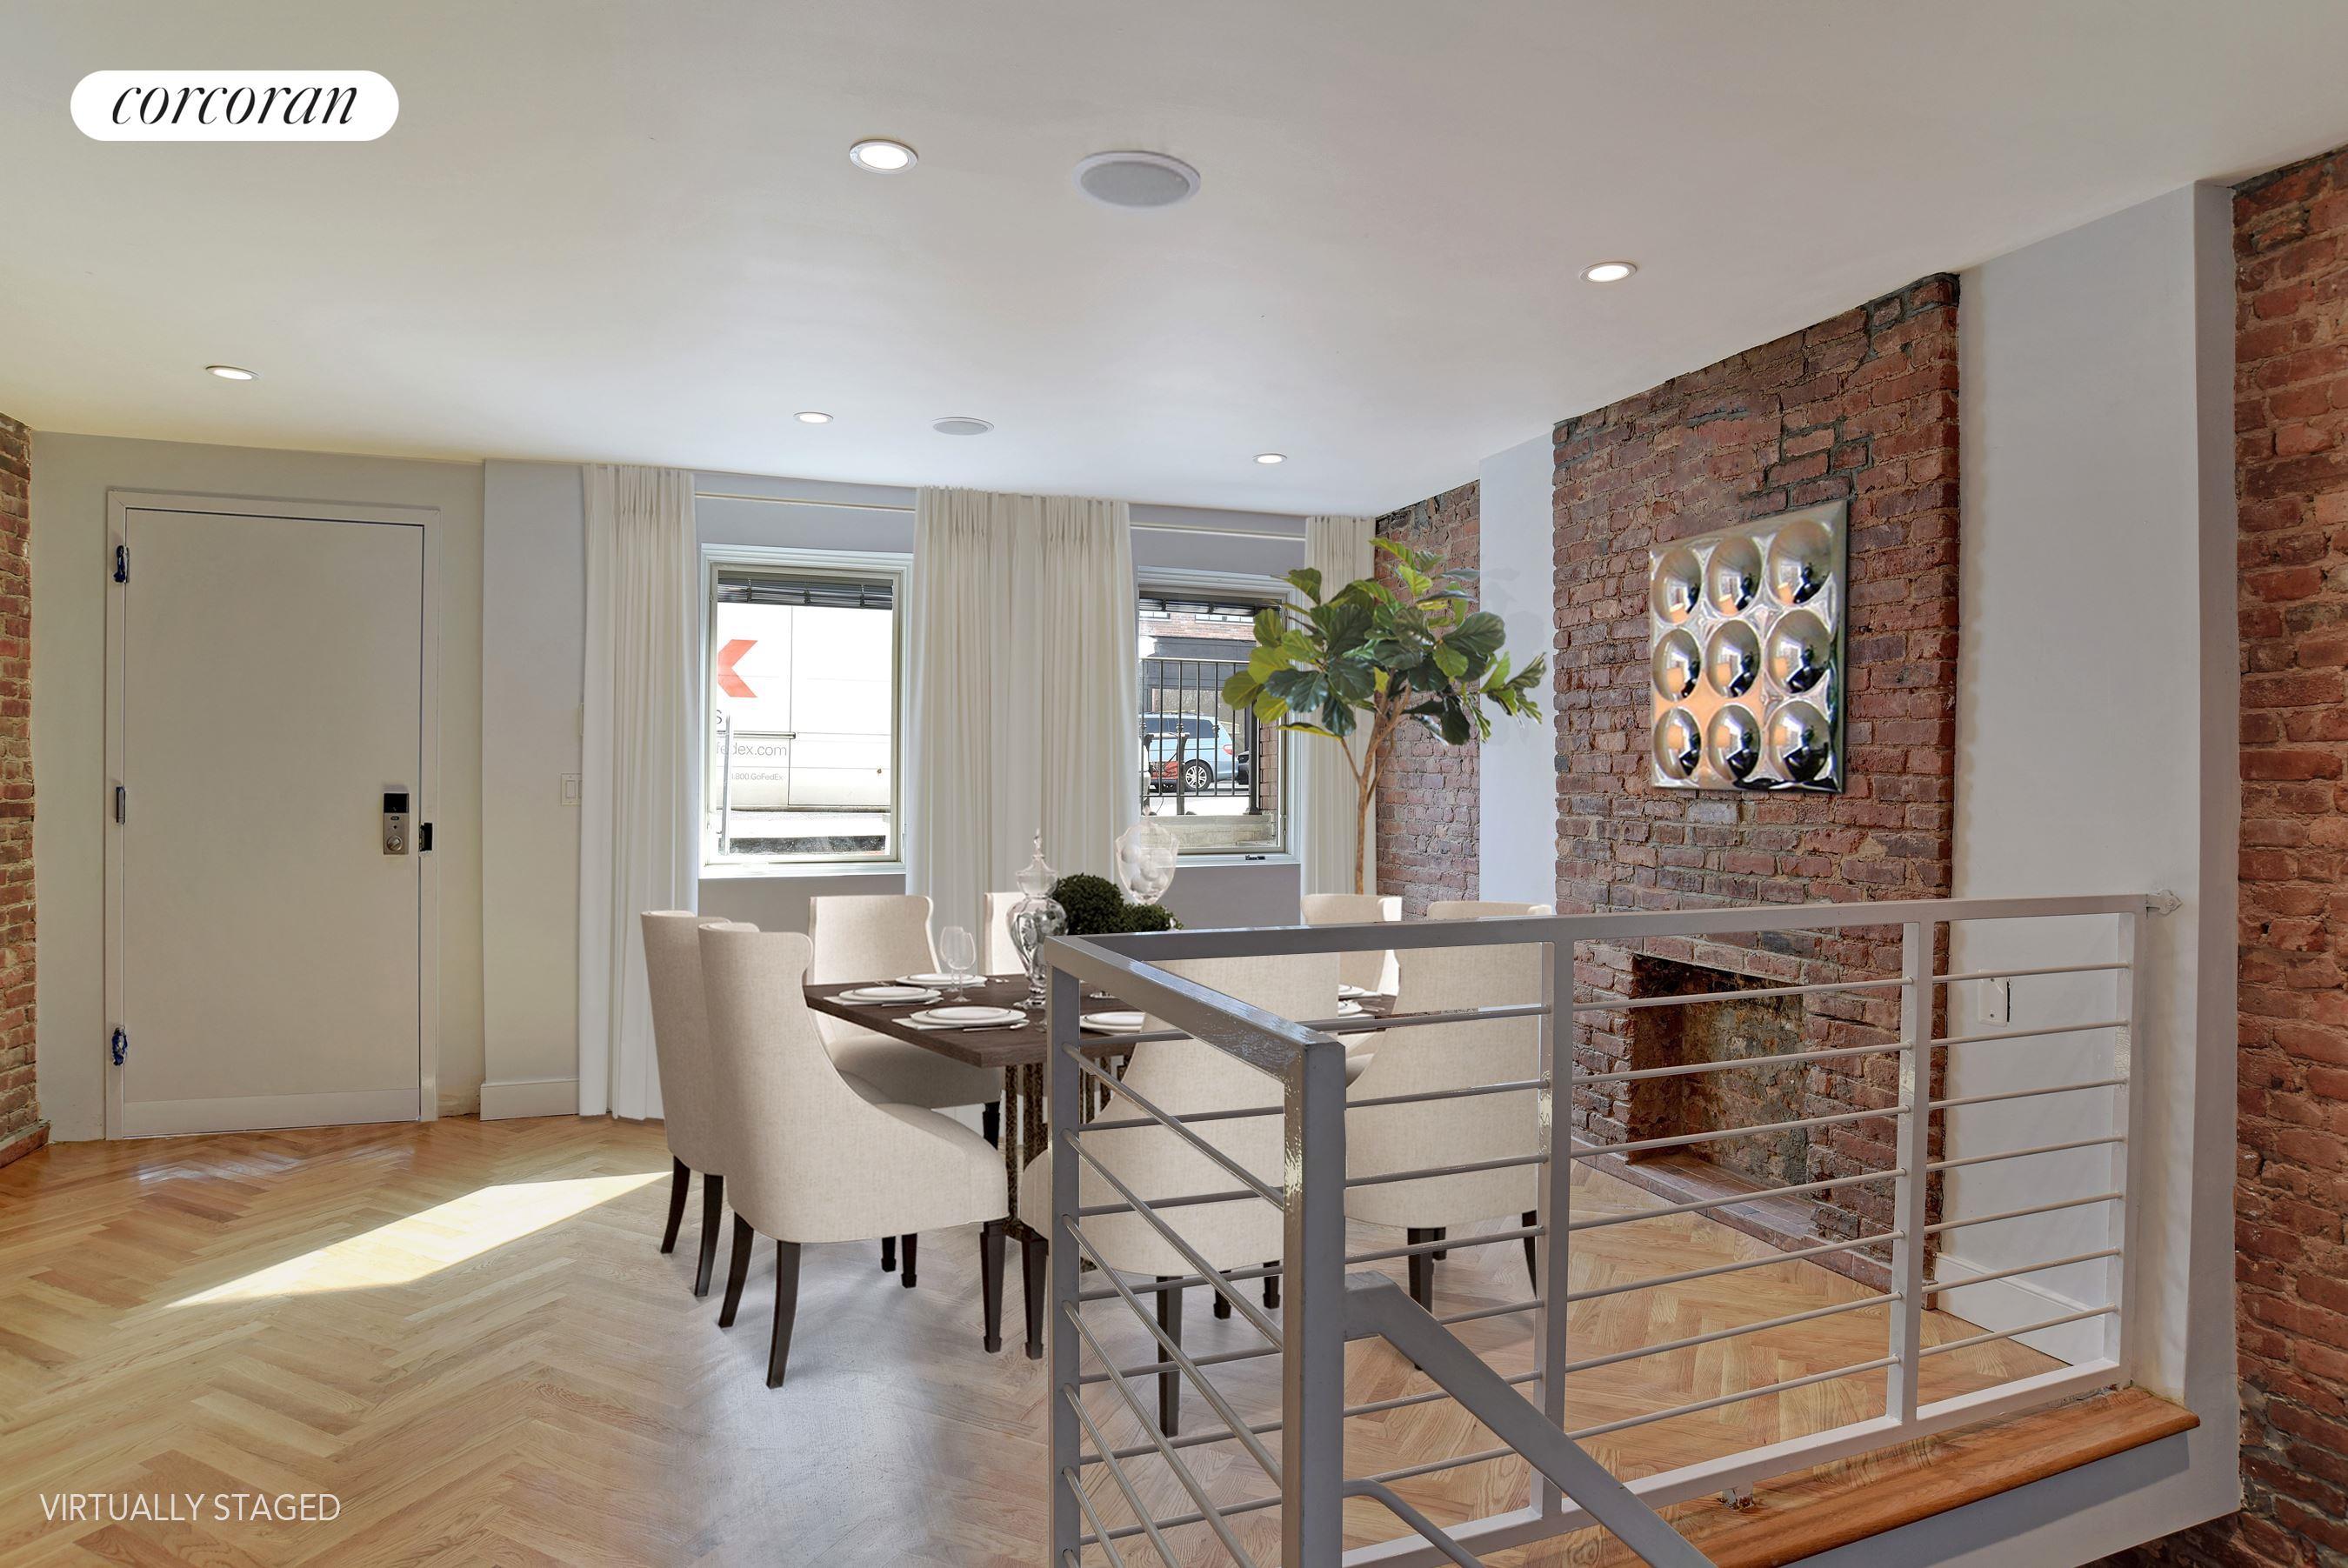 Corcoran, 488 3rd Avenue, Gowanus Real Estate, Brooklyn For Sale ...